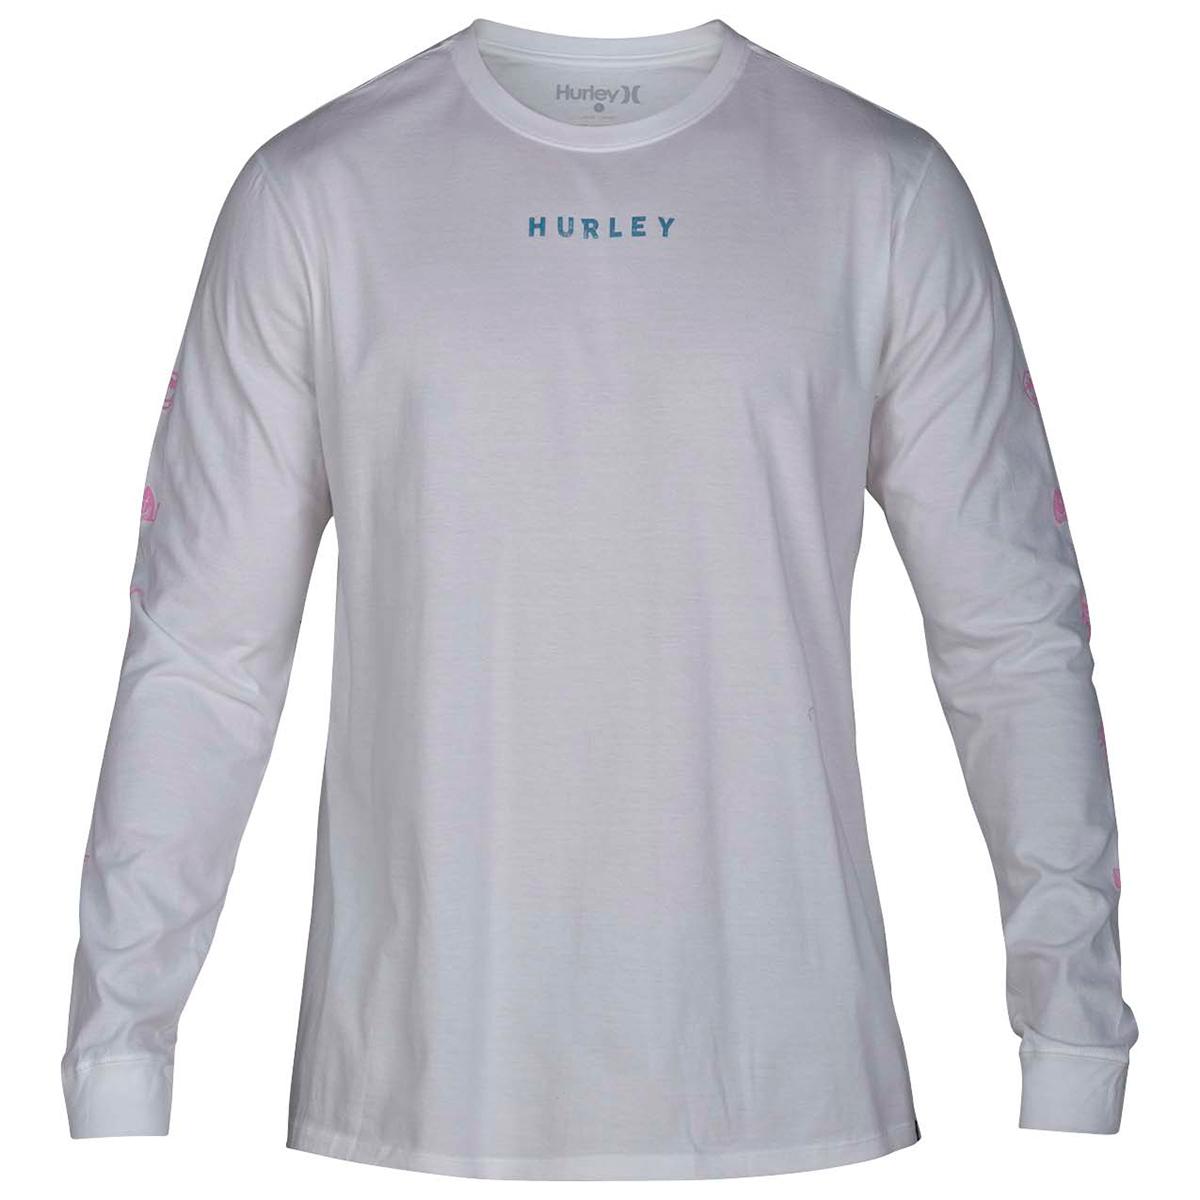 Hurley Men's Baby Burn Long-Sleeve Tee - White, XL